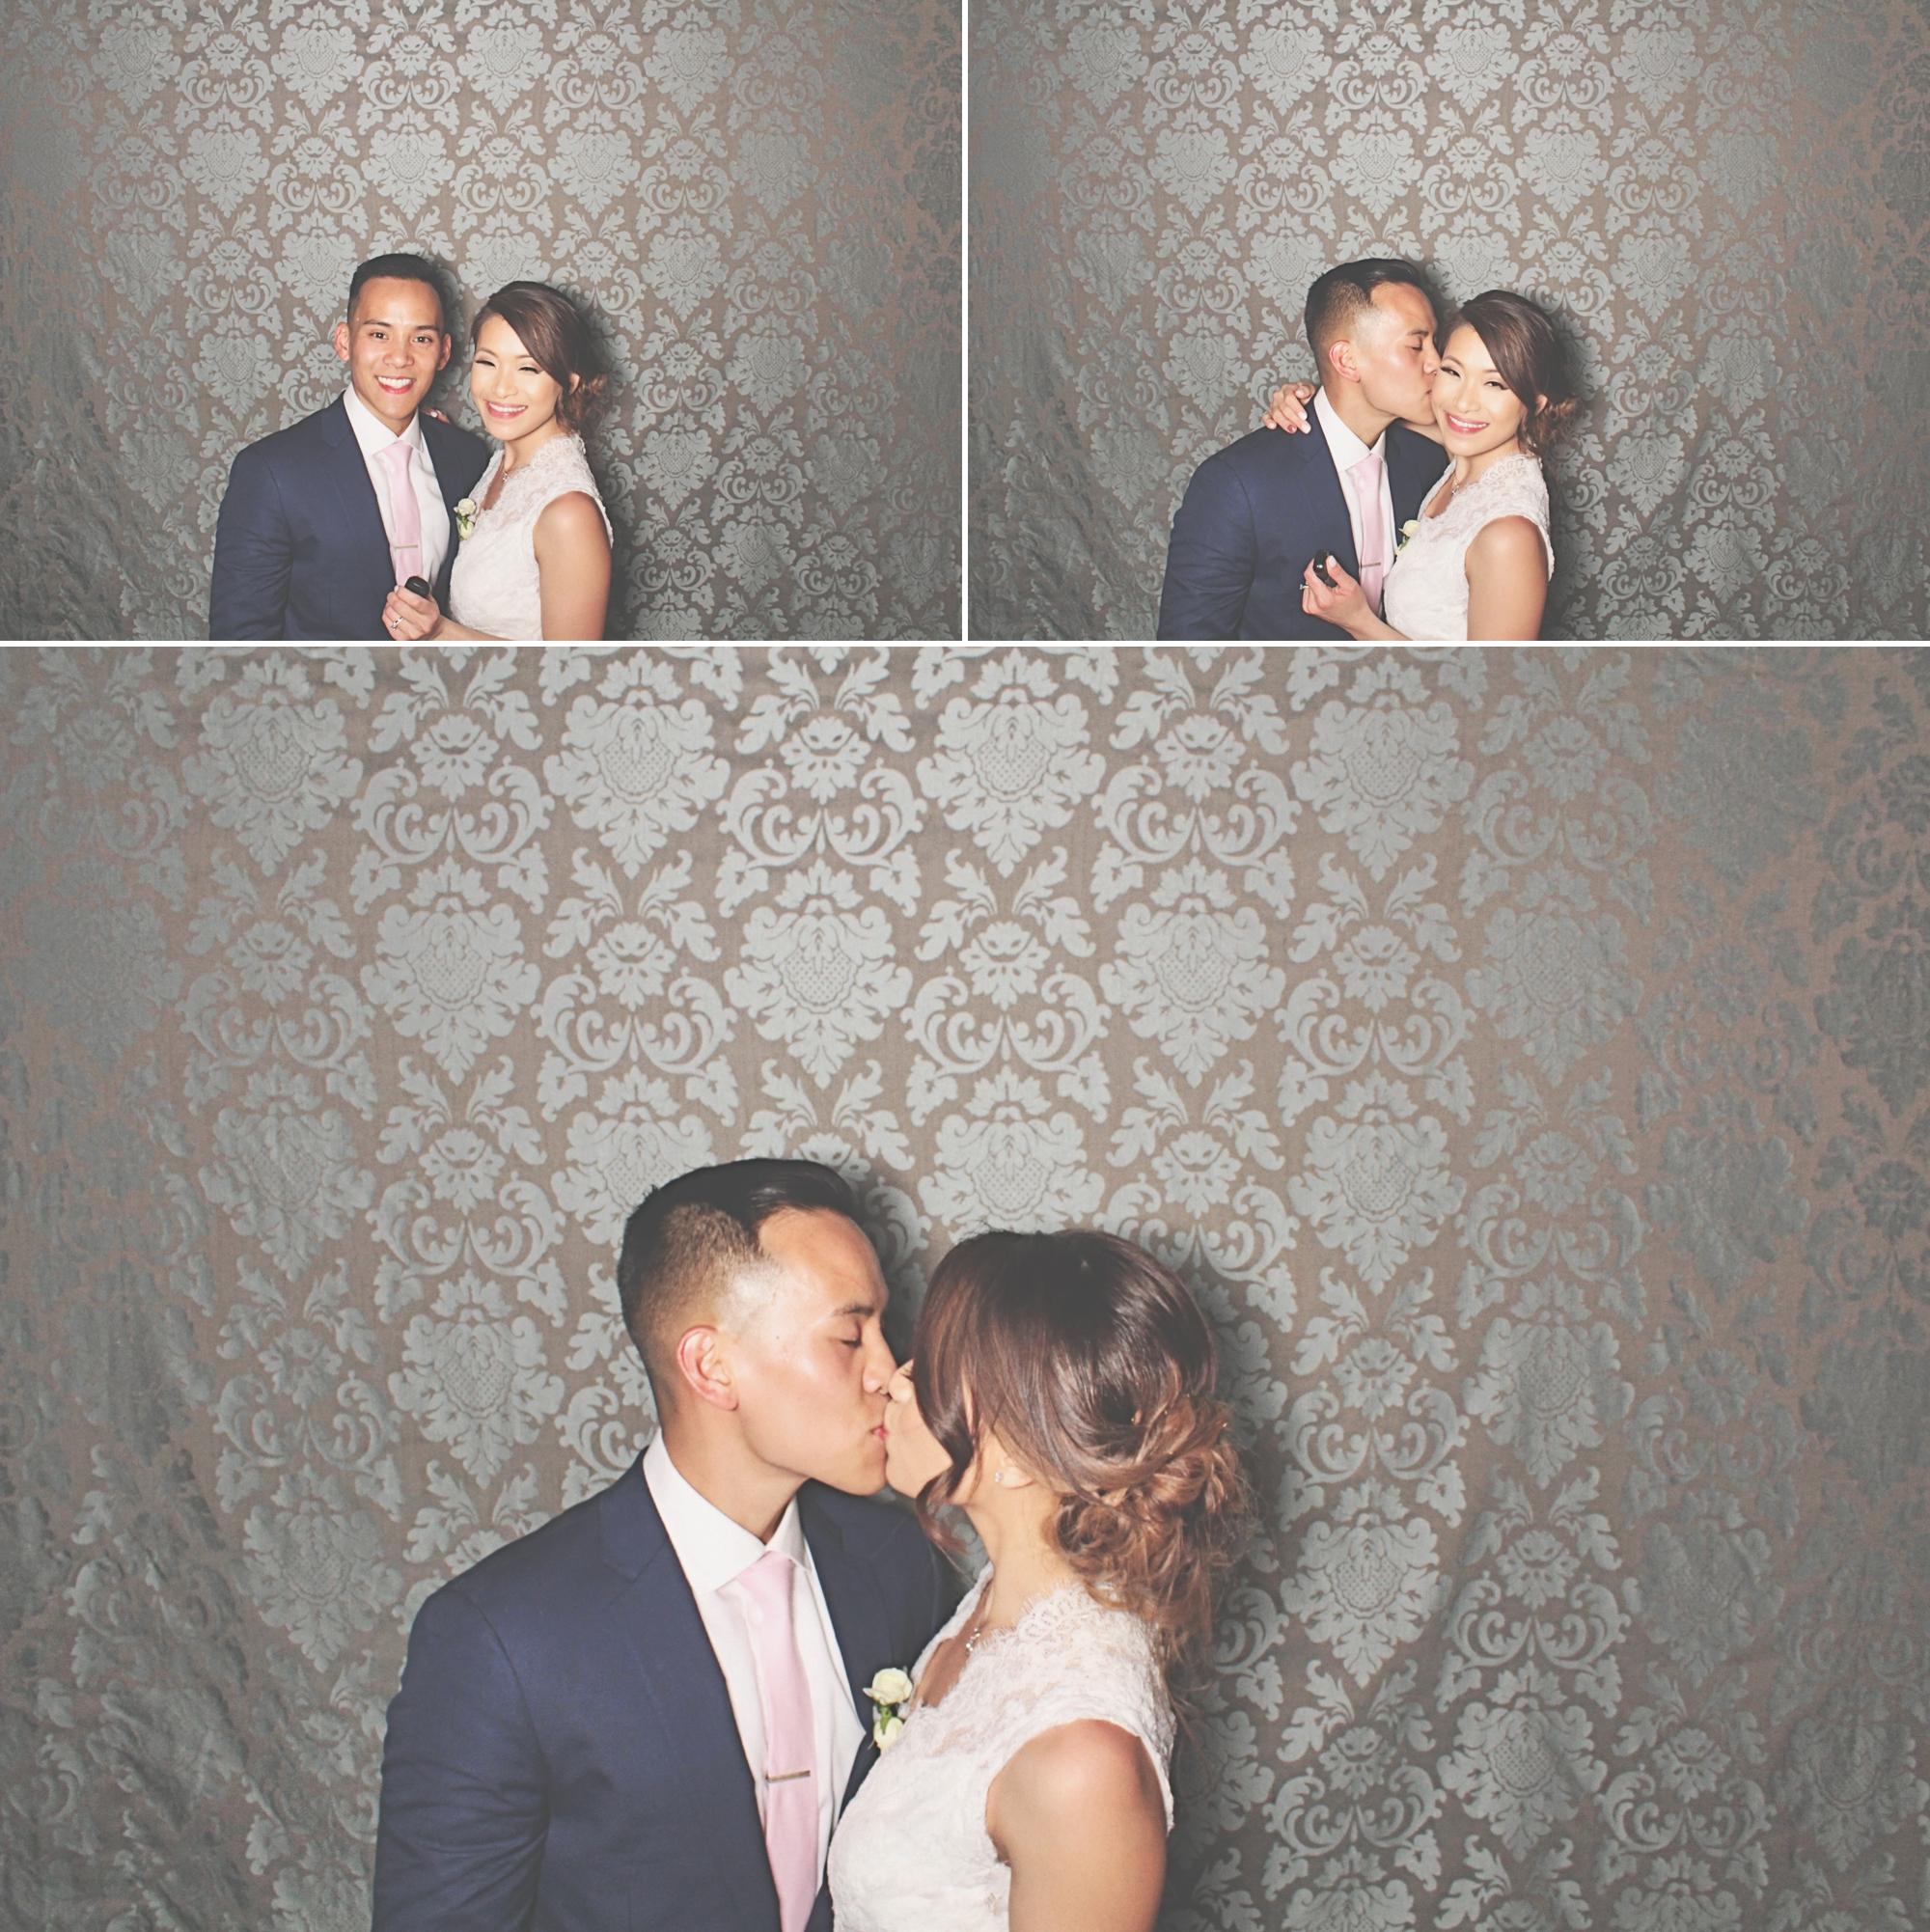 Wedding PhotoBooth - The Wright Farm - RobotBooth 7